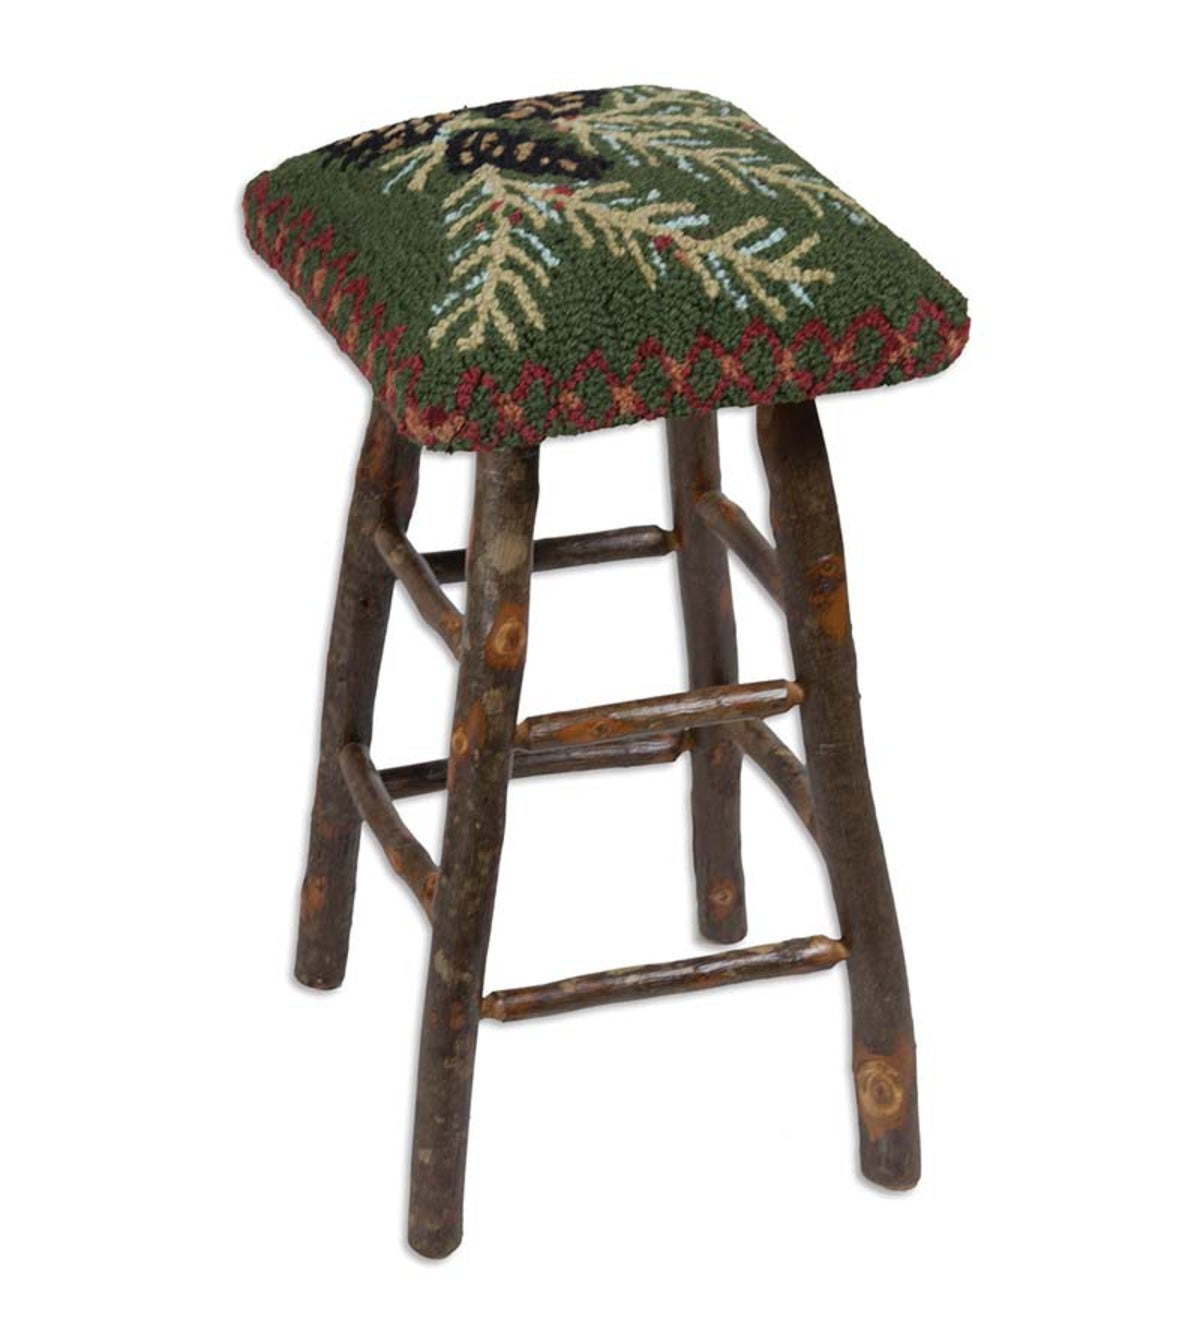 Pine Cone Bar Stool